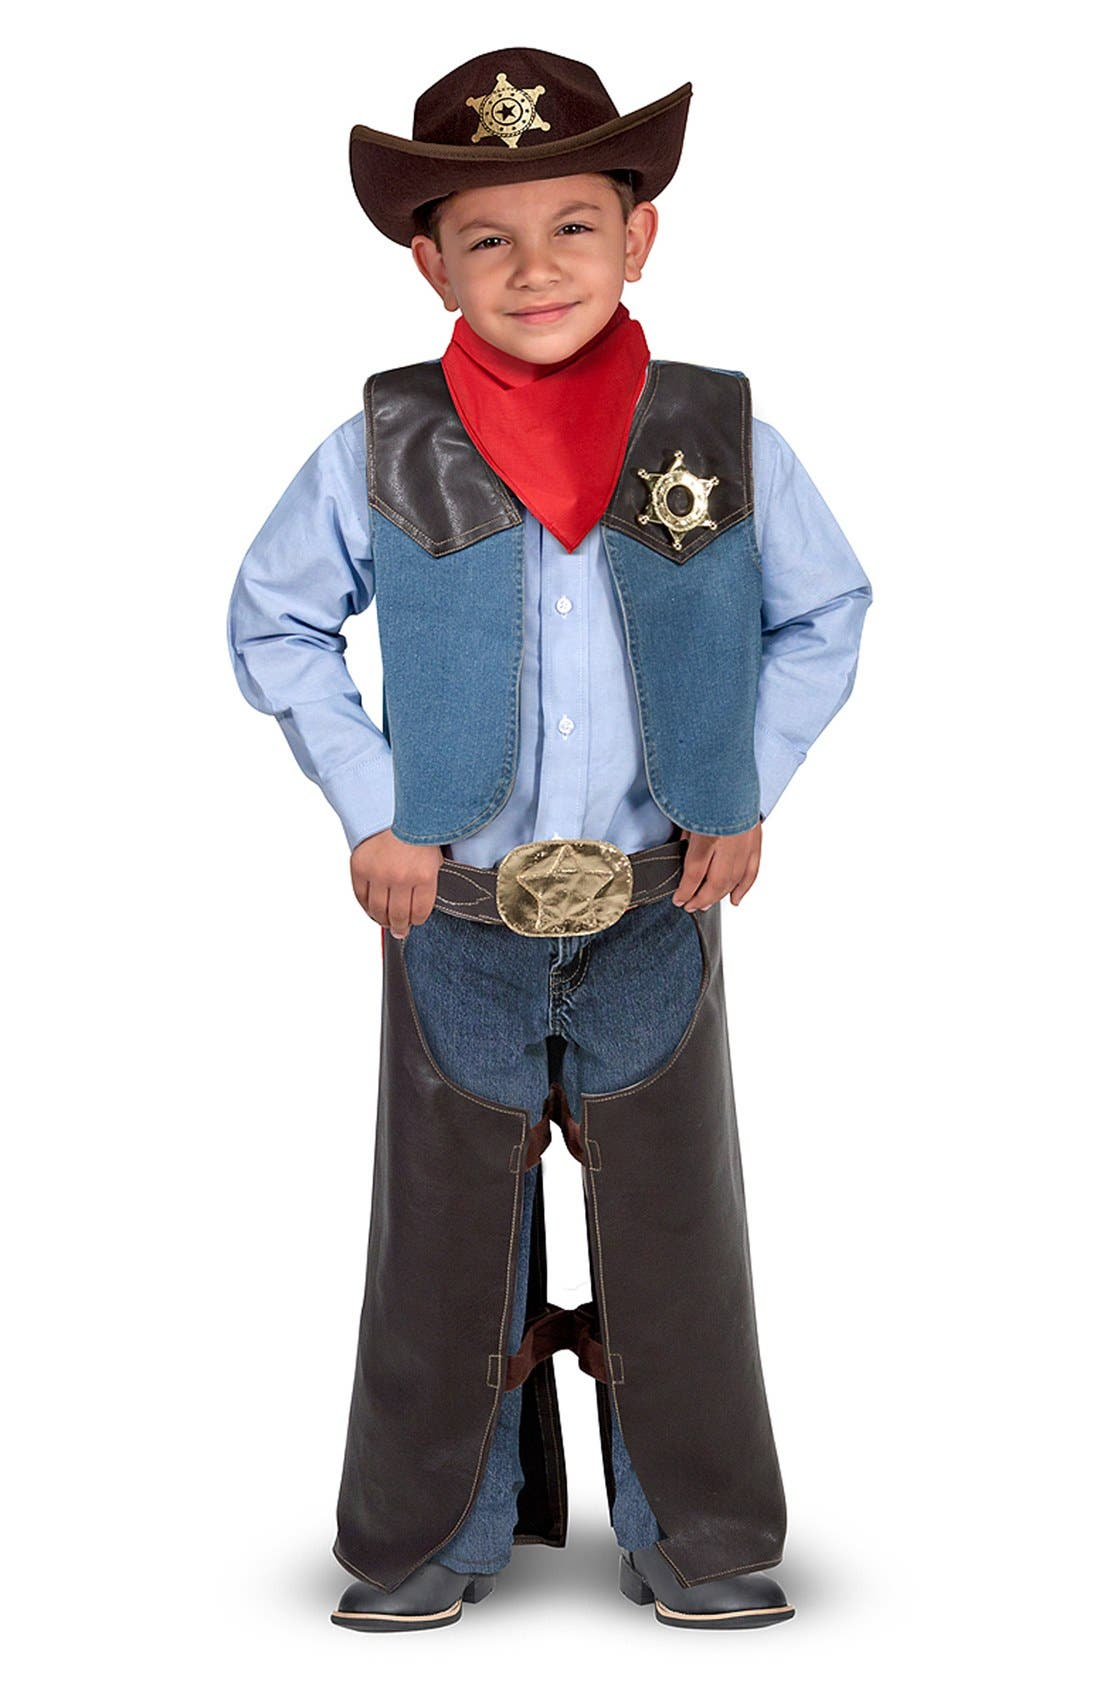 Cowboy Role Play Set,                             Main thumbnail 1, color,                             Brown